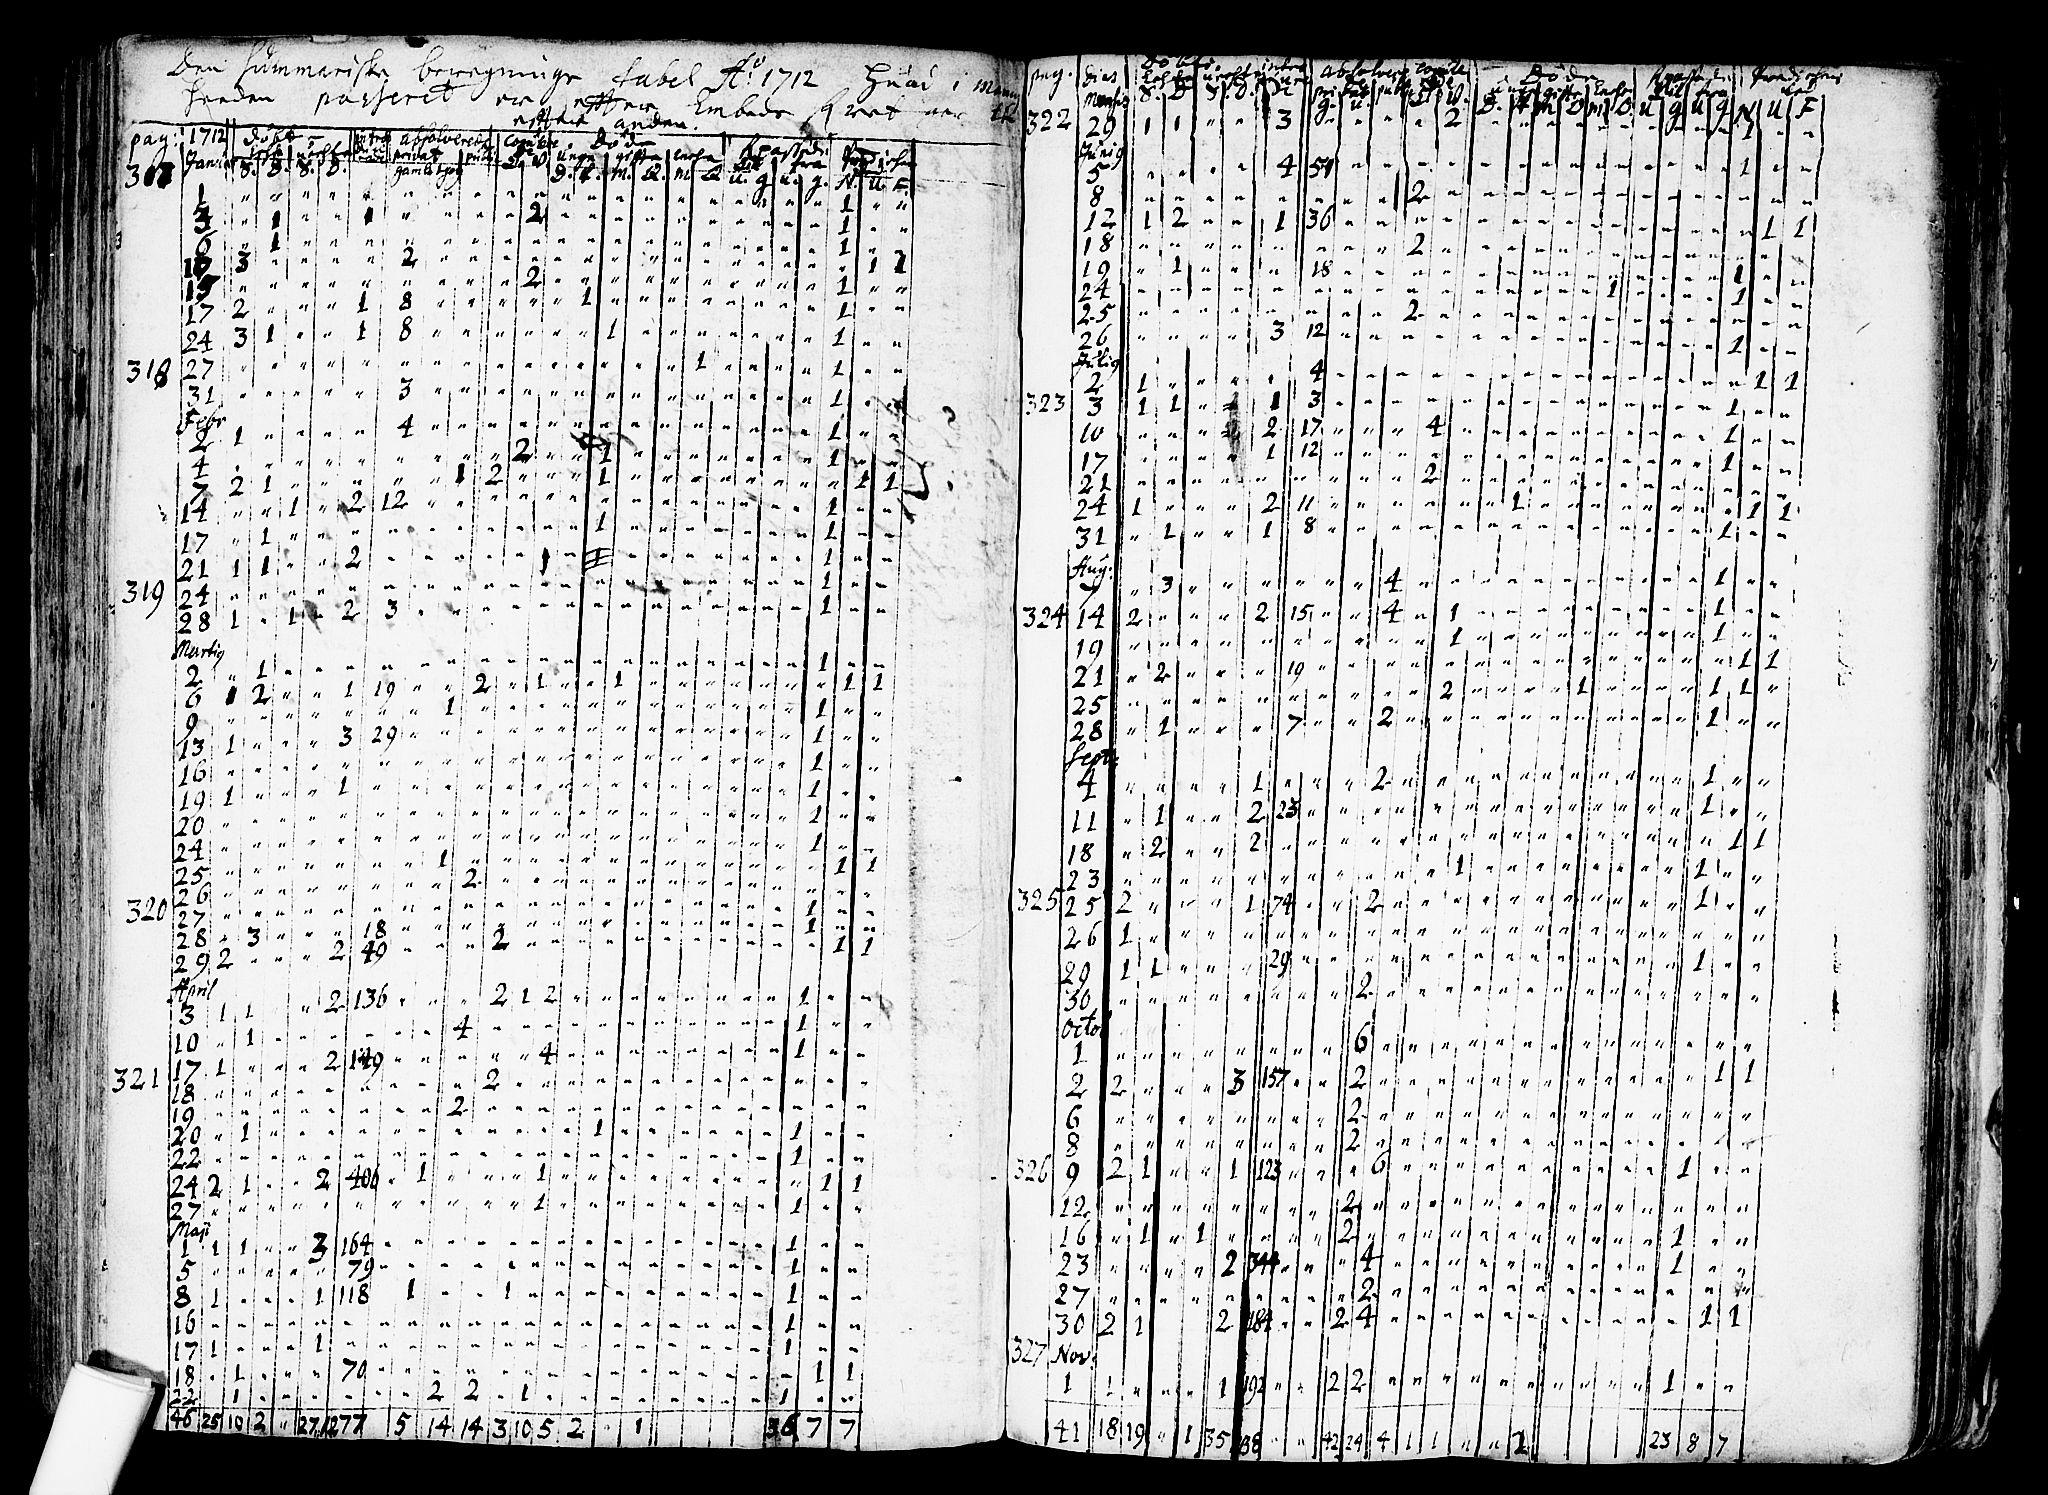 SAO, Nes prestekontor Kirkebøker, F/Fa/L0001: Parish register (official) no. I 1, 1689-1716, p. 316b-316c